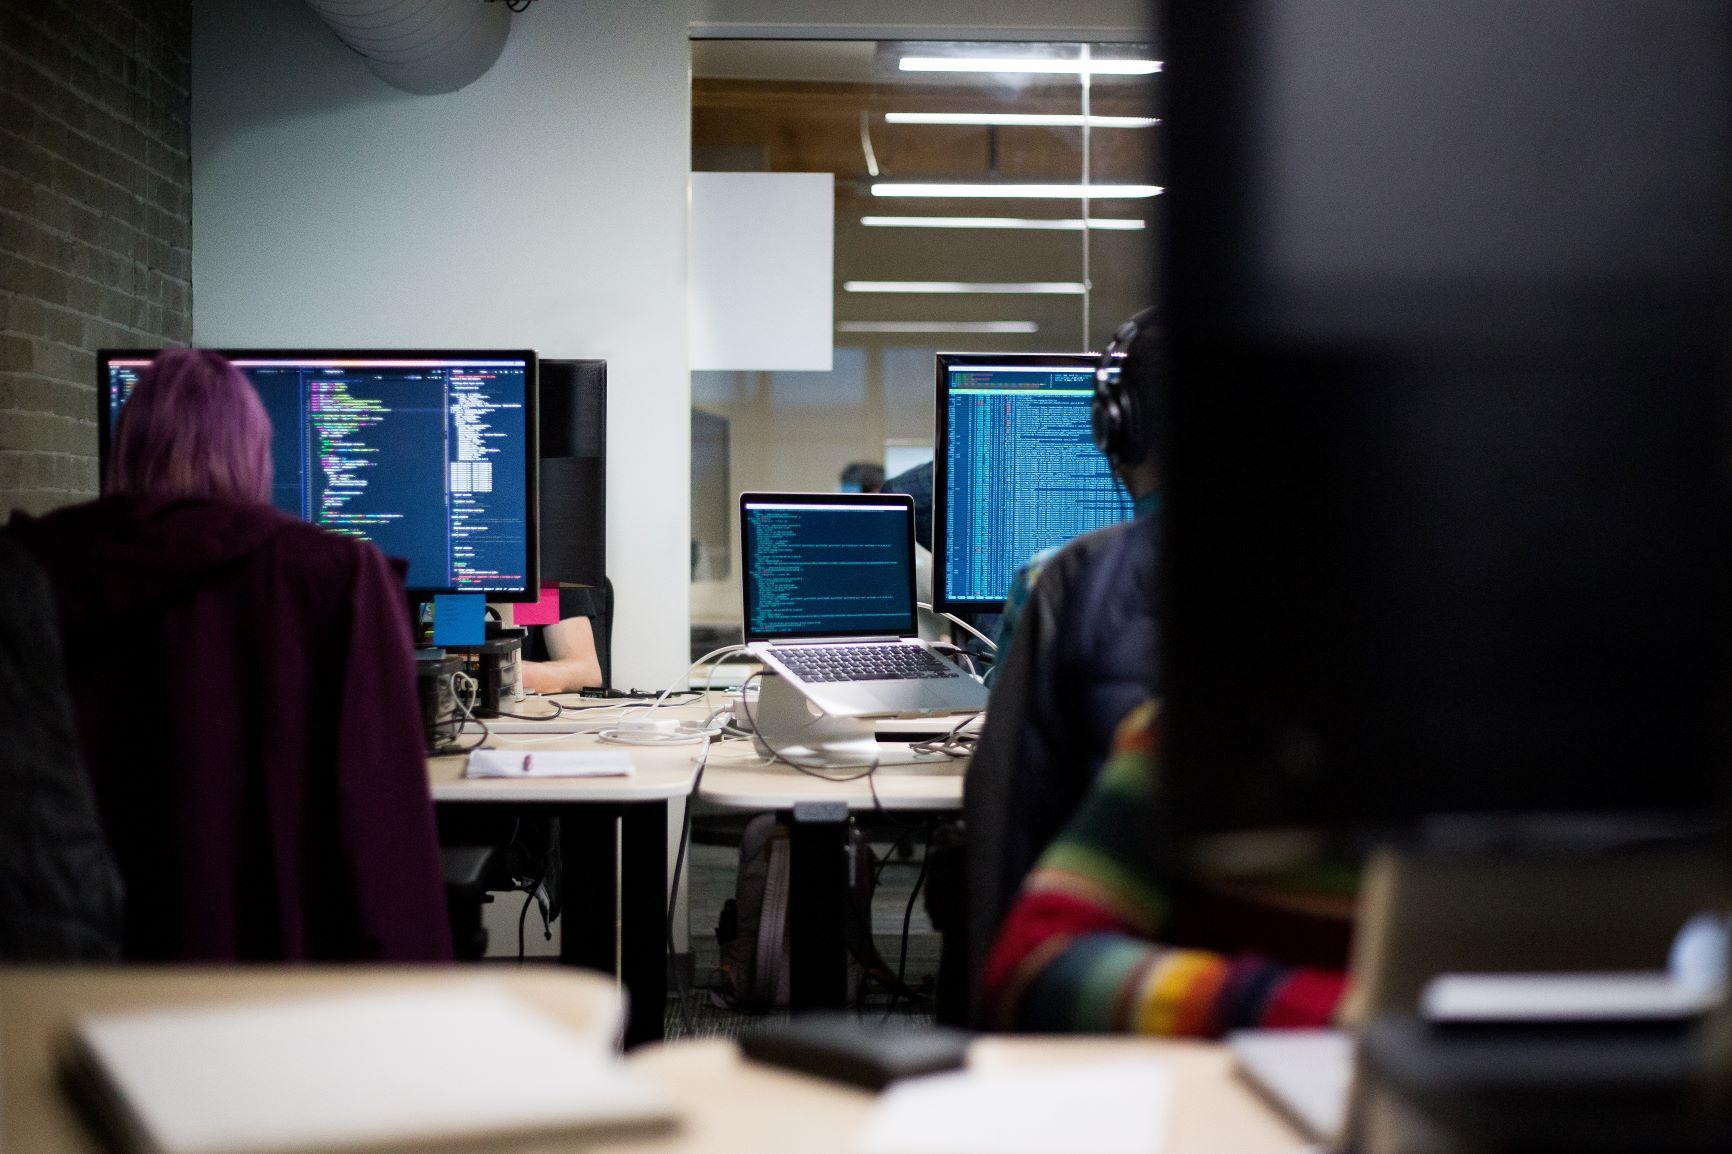 coders sat at computer screens